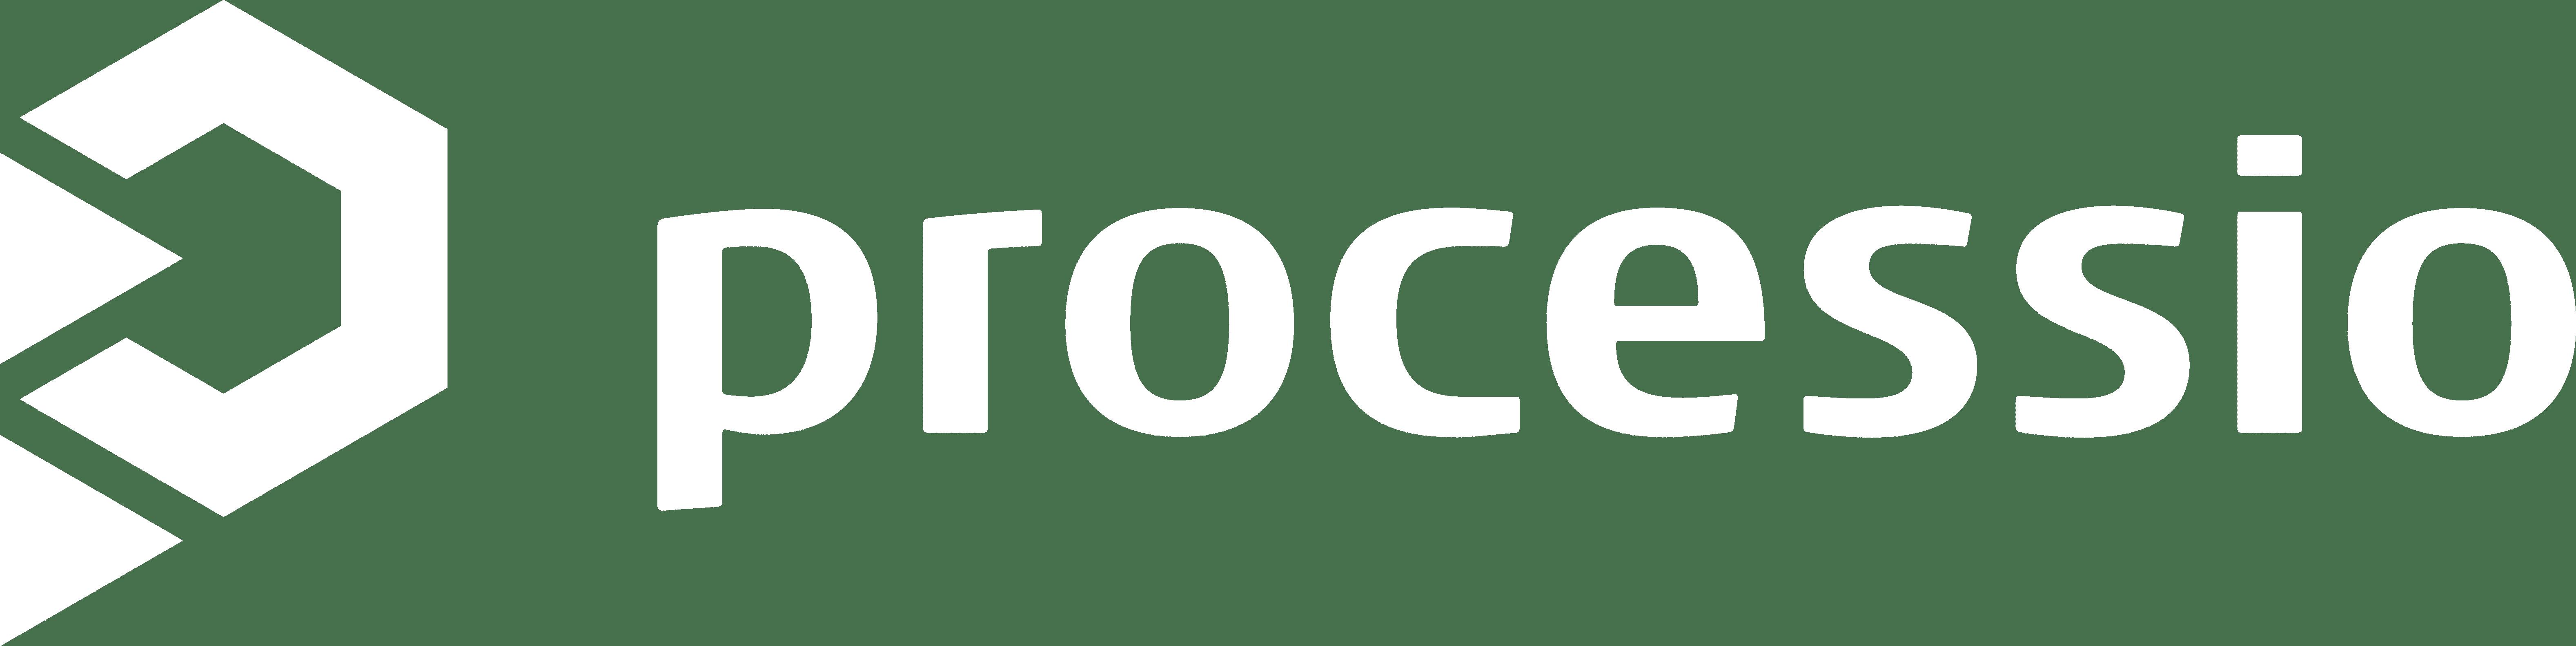 Processio GmbH Logo